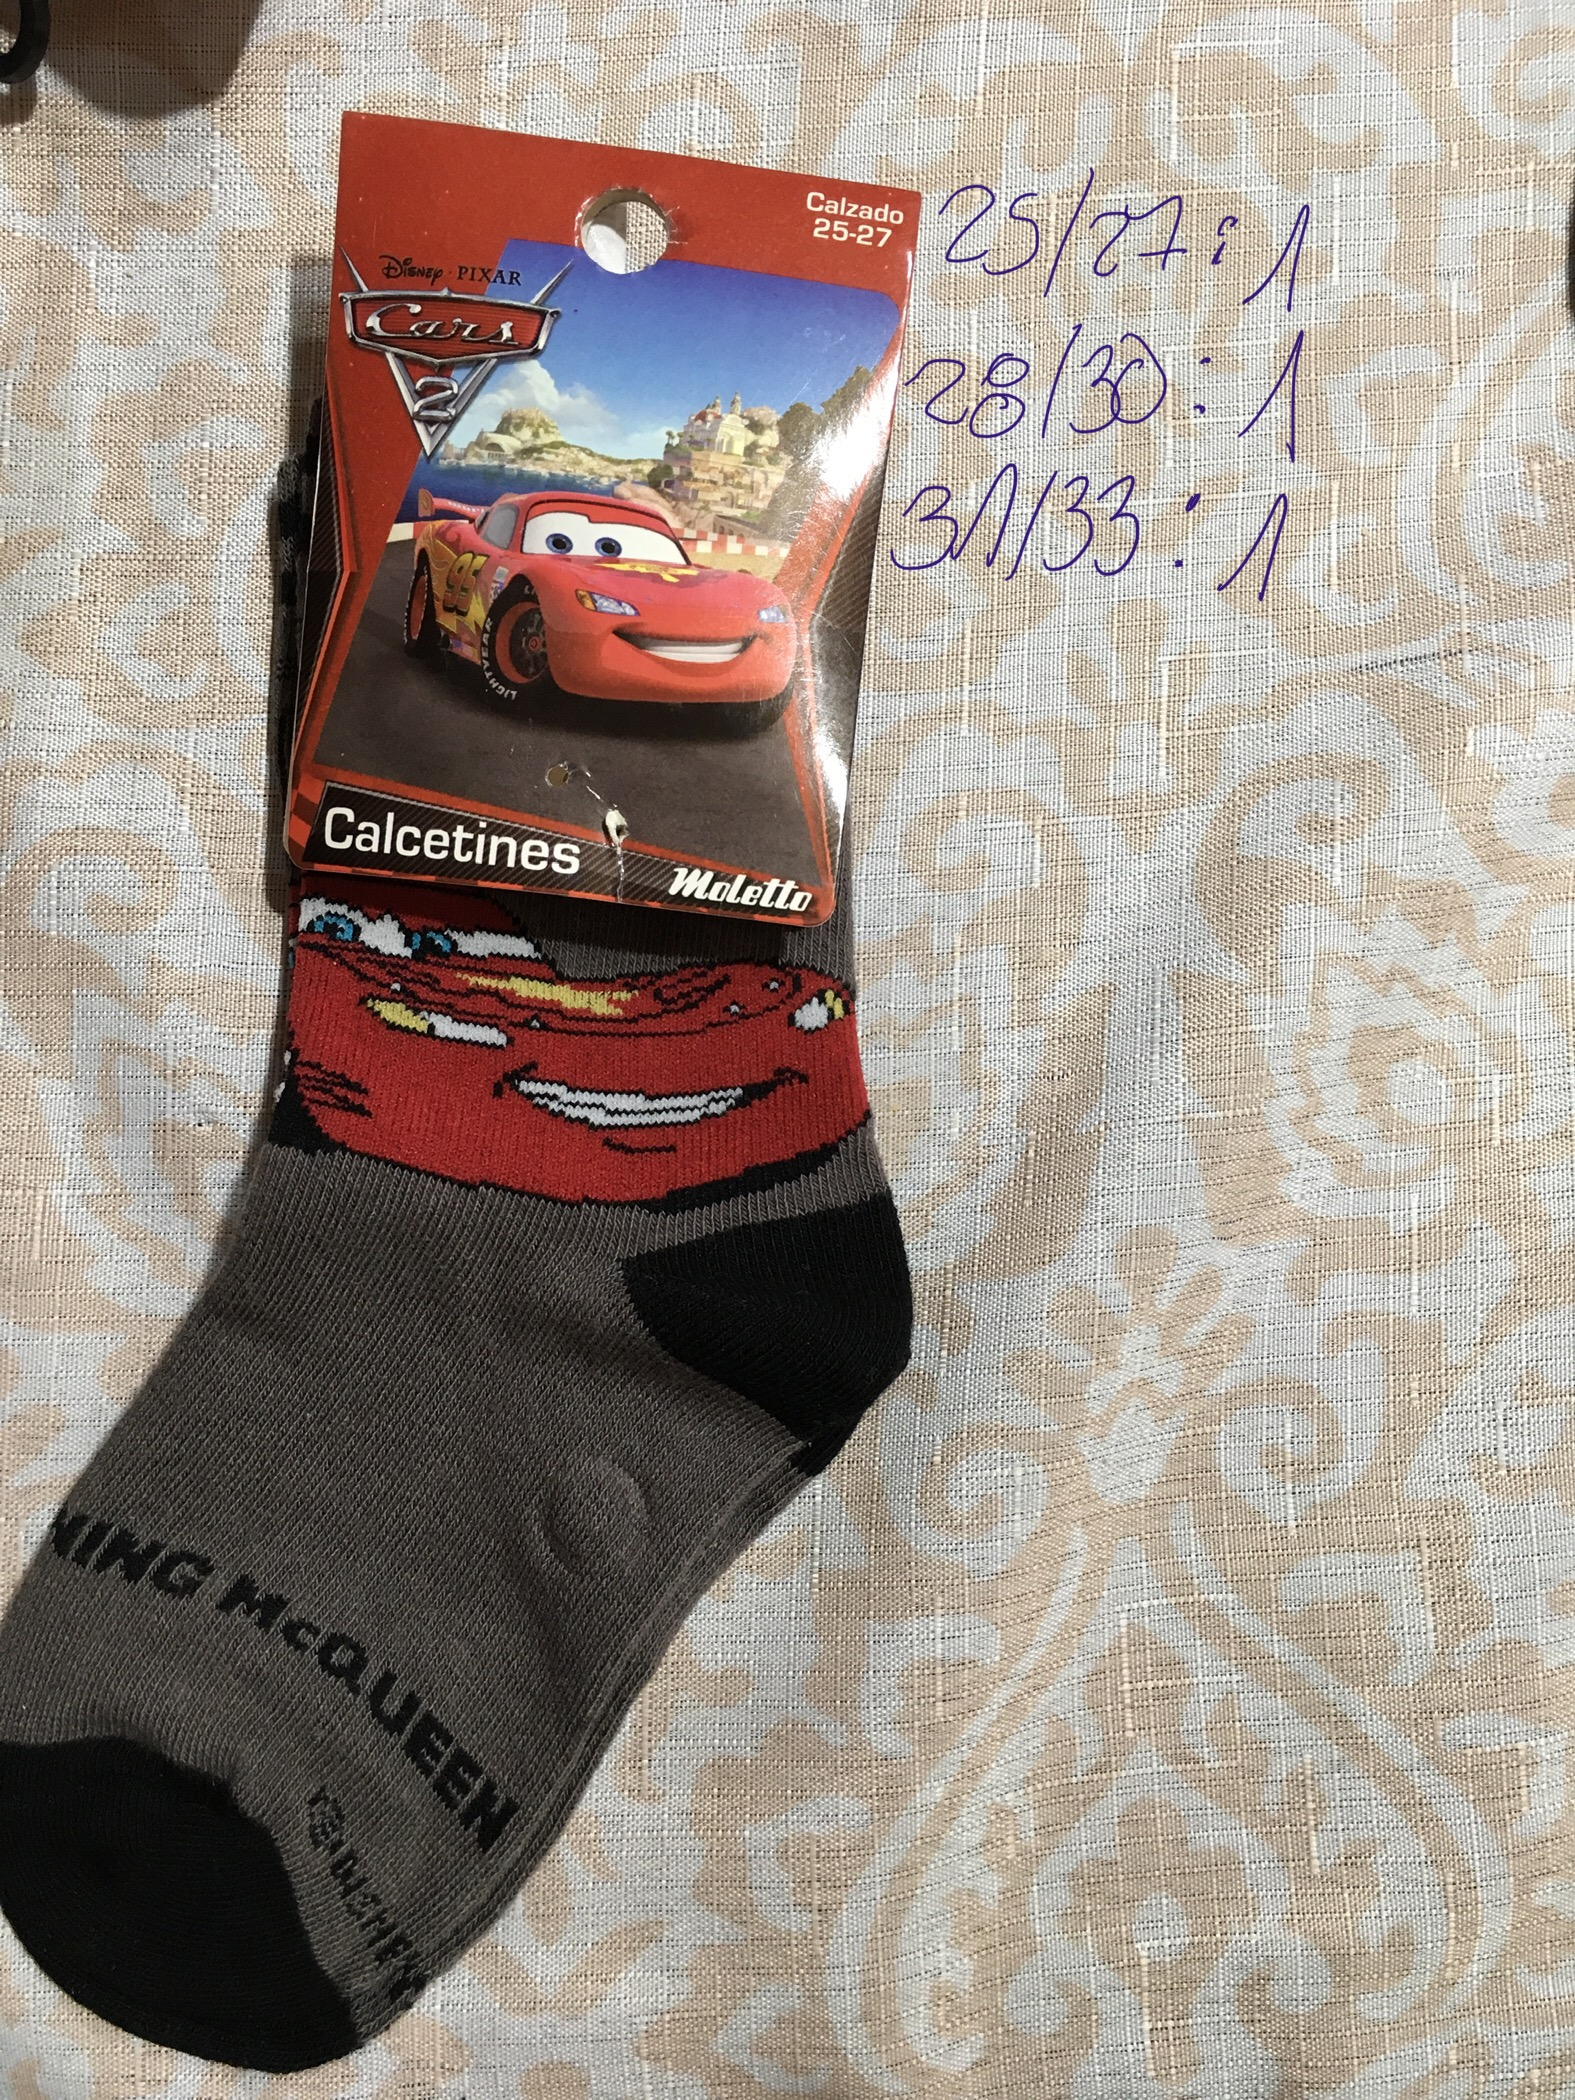 calcetin disney cars diseño king Mcqueen 1 par gris negro